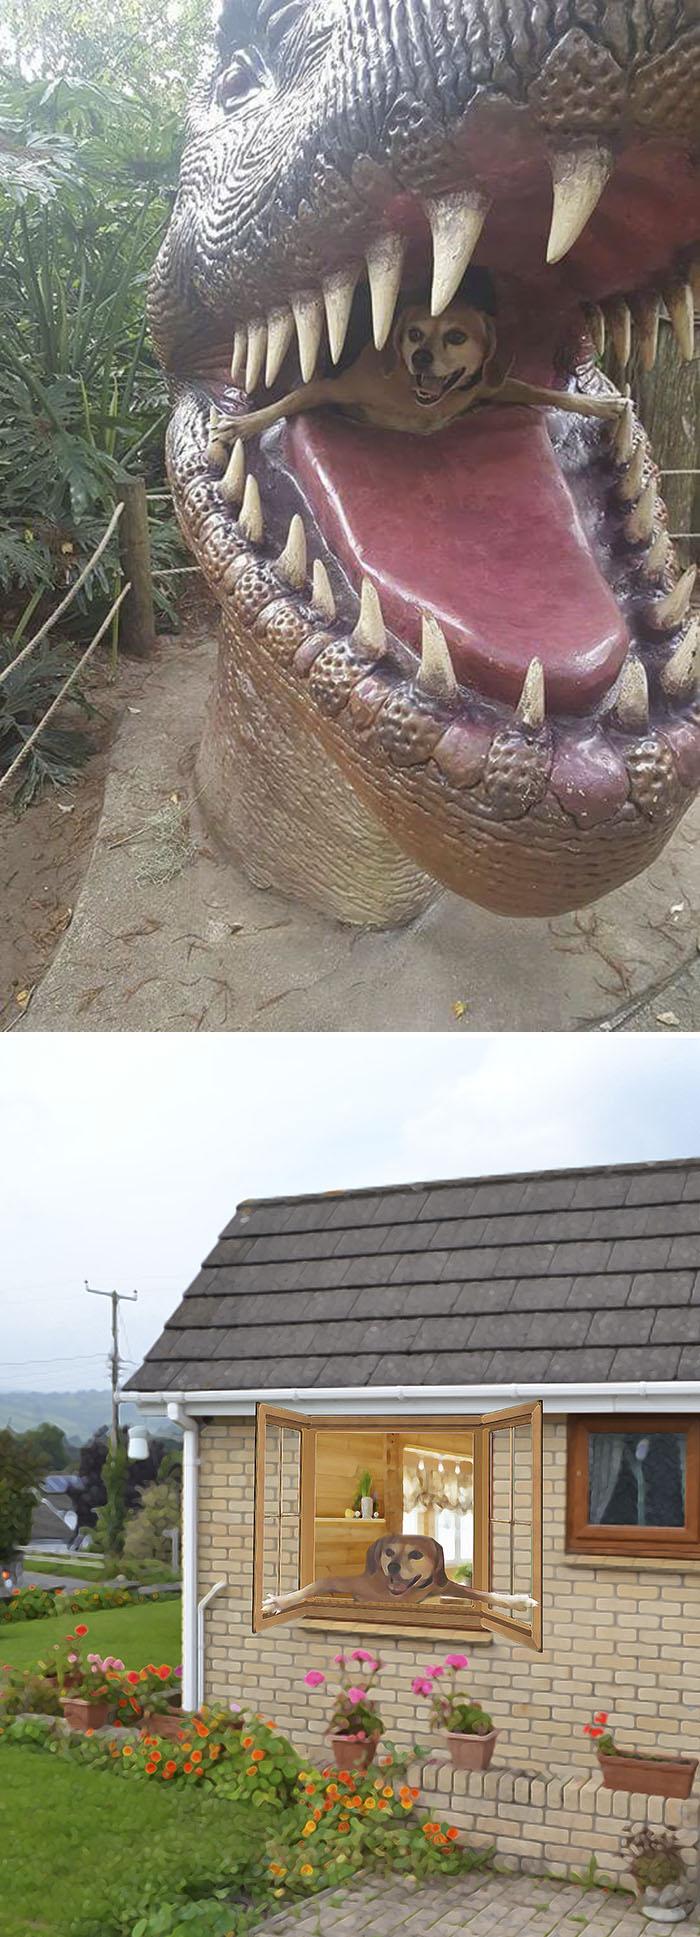 Dog Inside T-rex Mouth